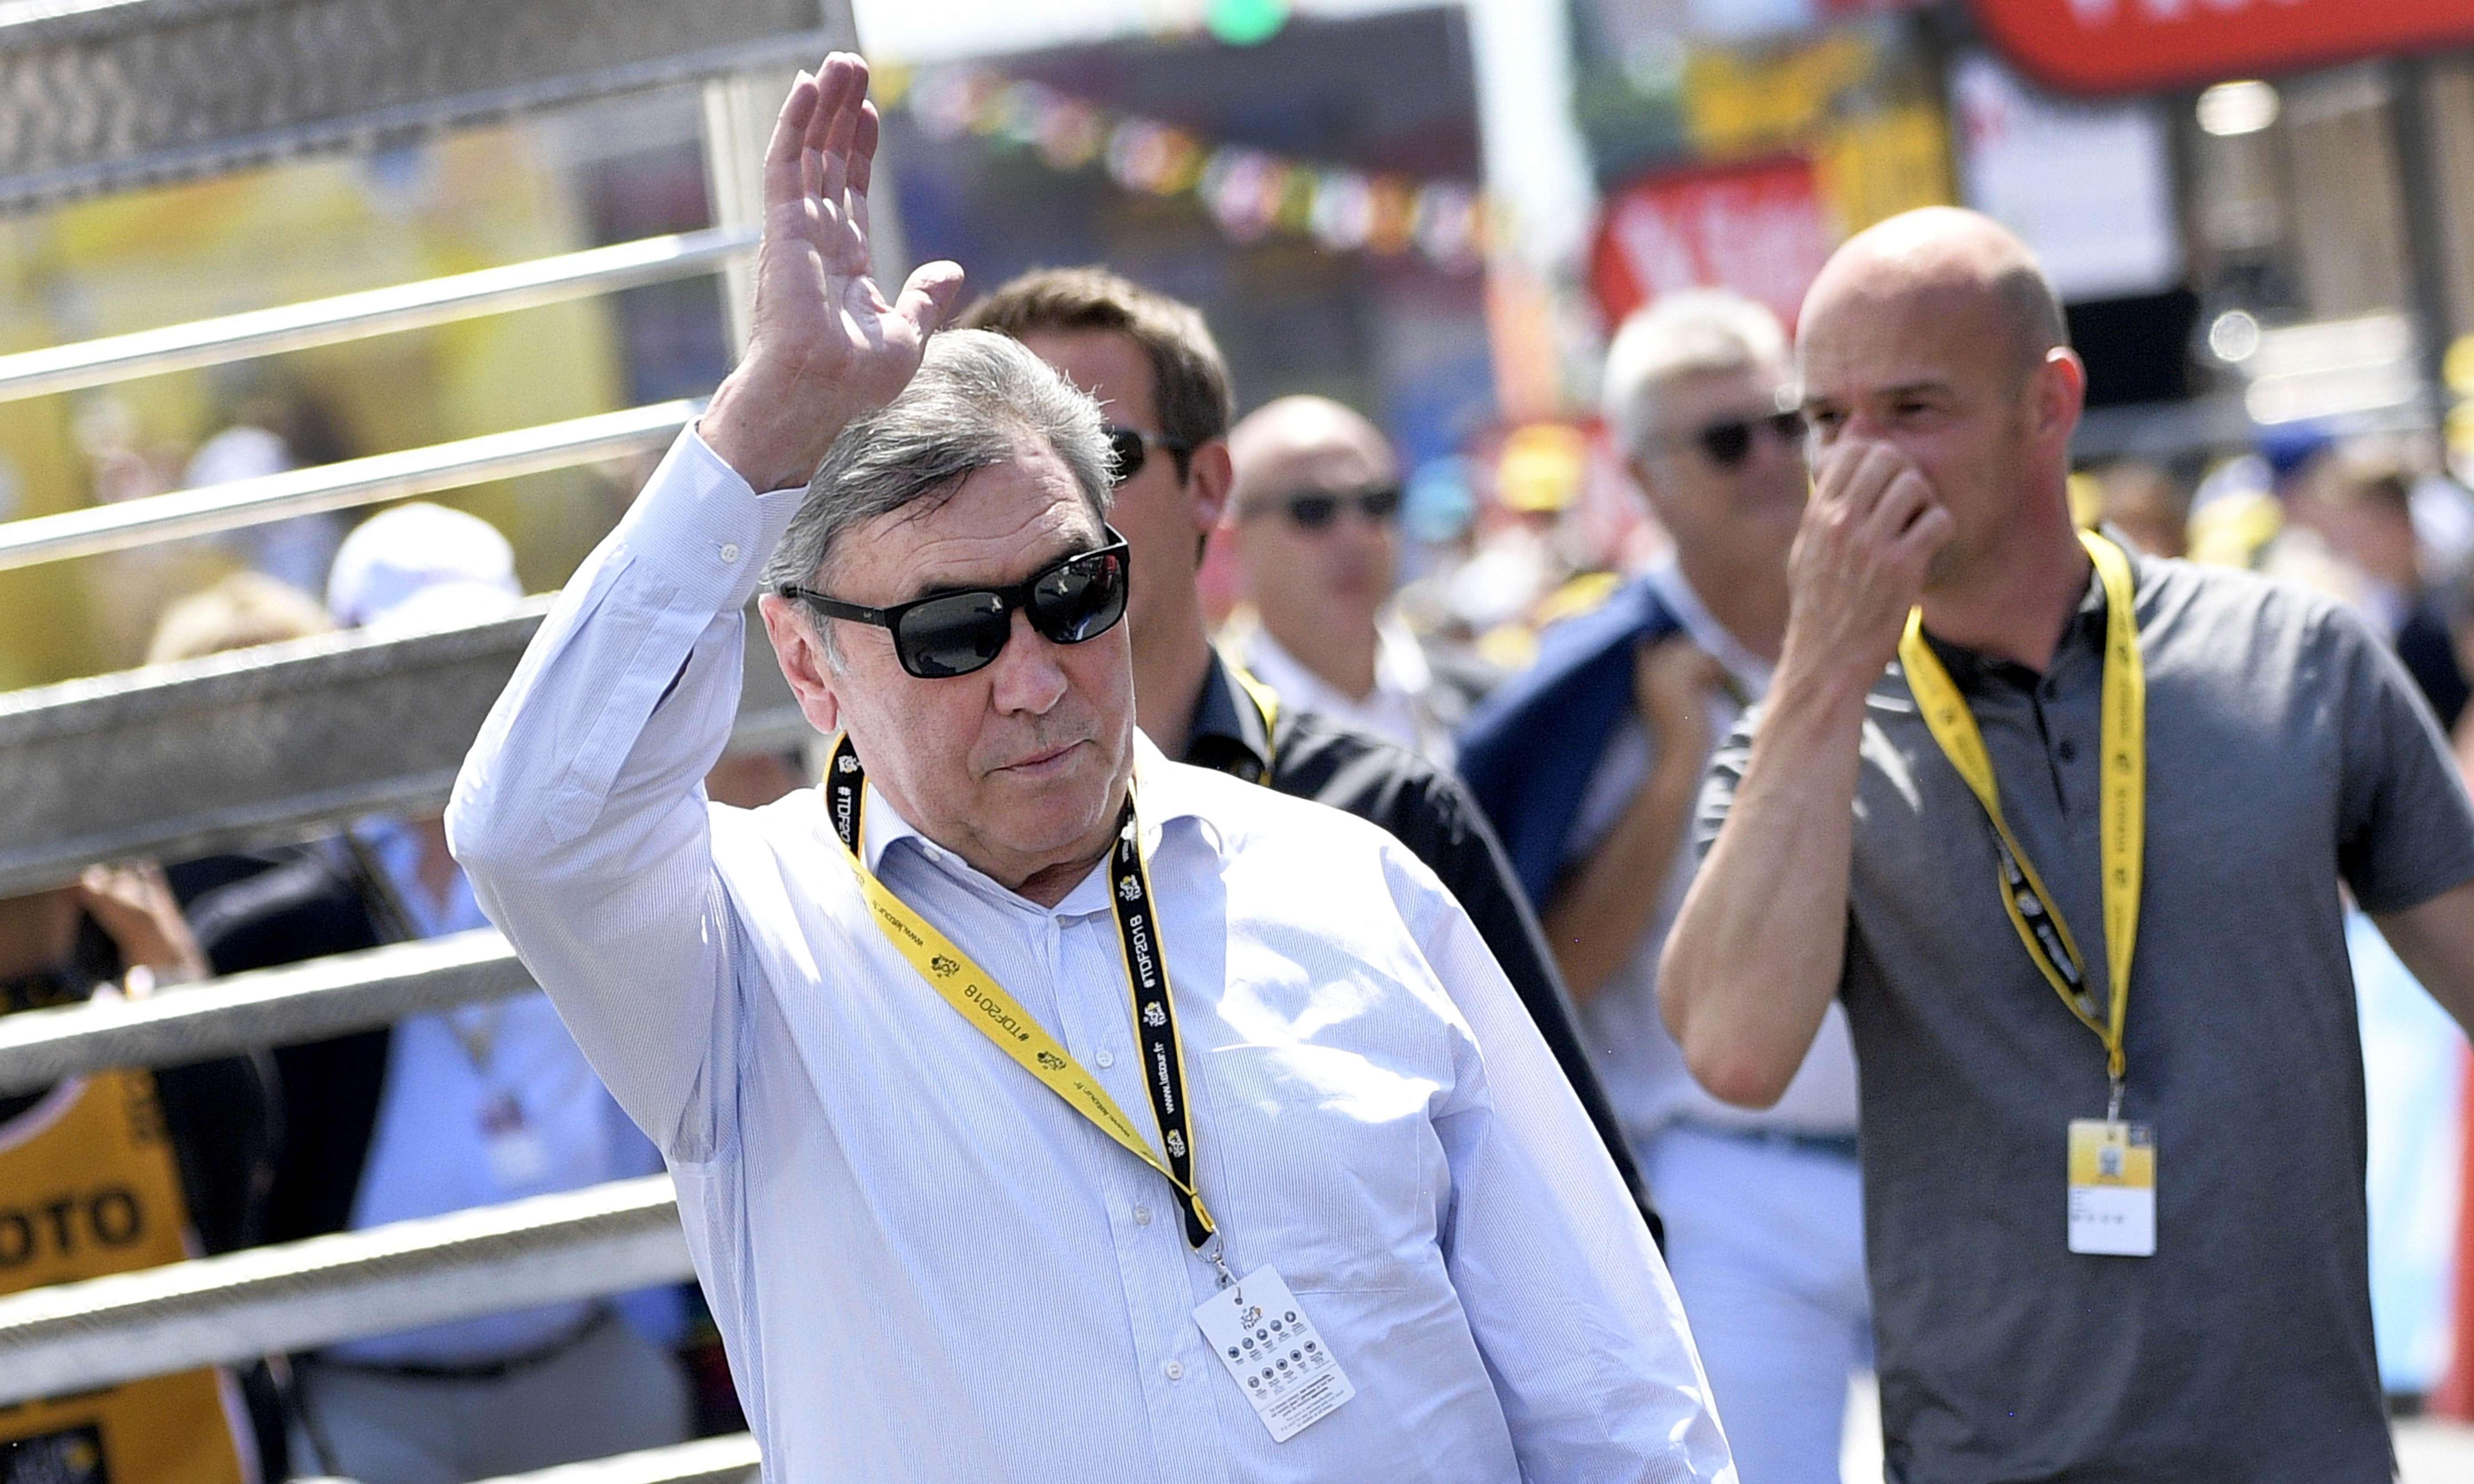 Eddy Merckx - Tour de France